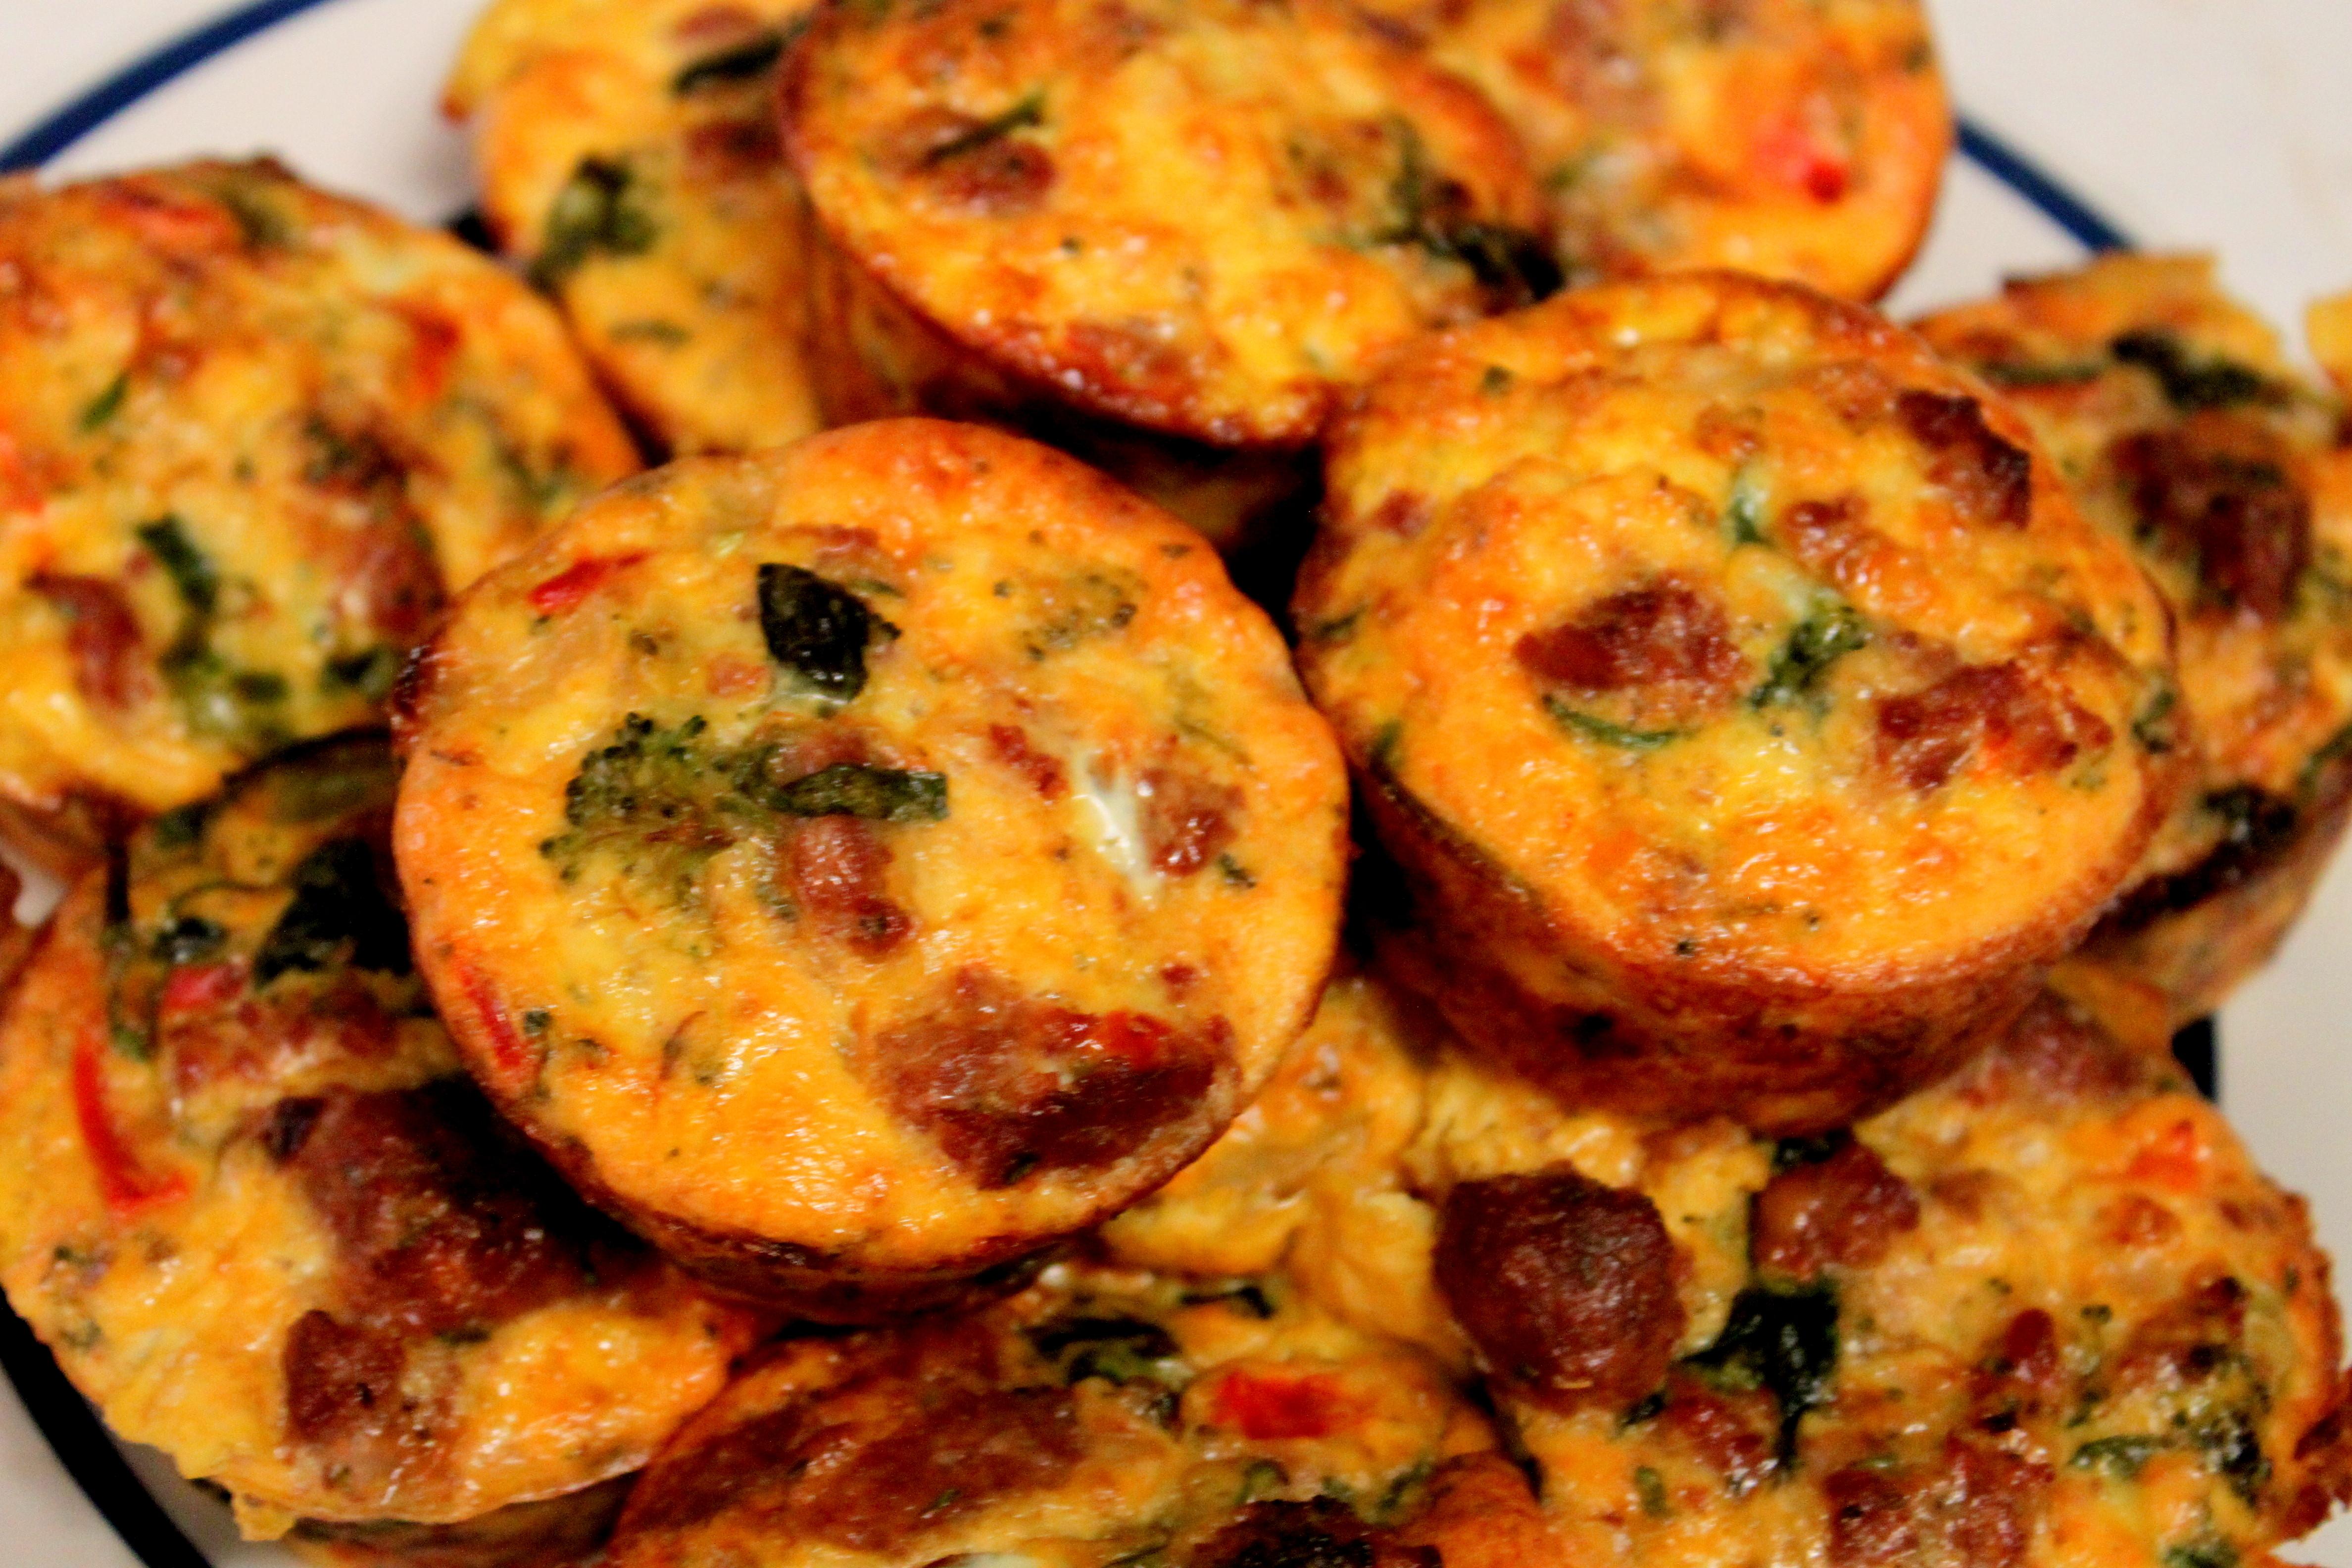 vucut-gelistirmeye-uygun-yumurta-ve-hindi-fumeli-muffin-tarifi